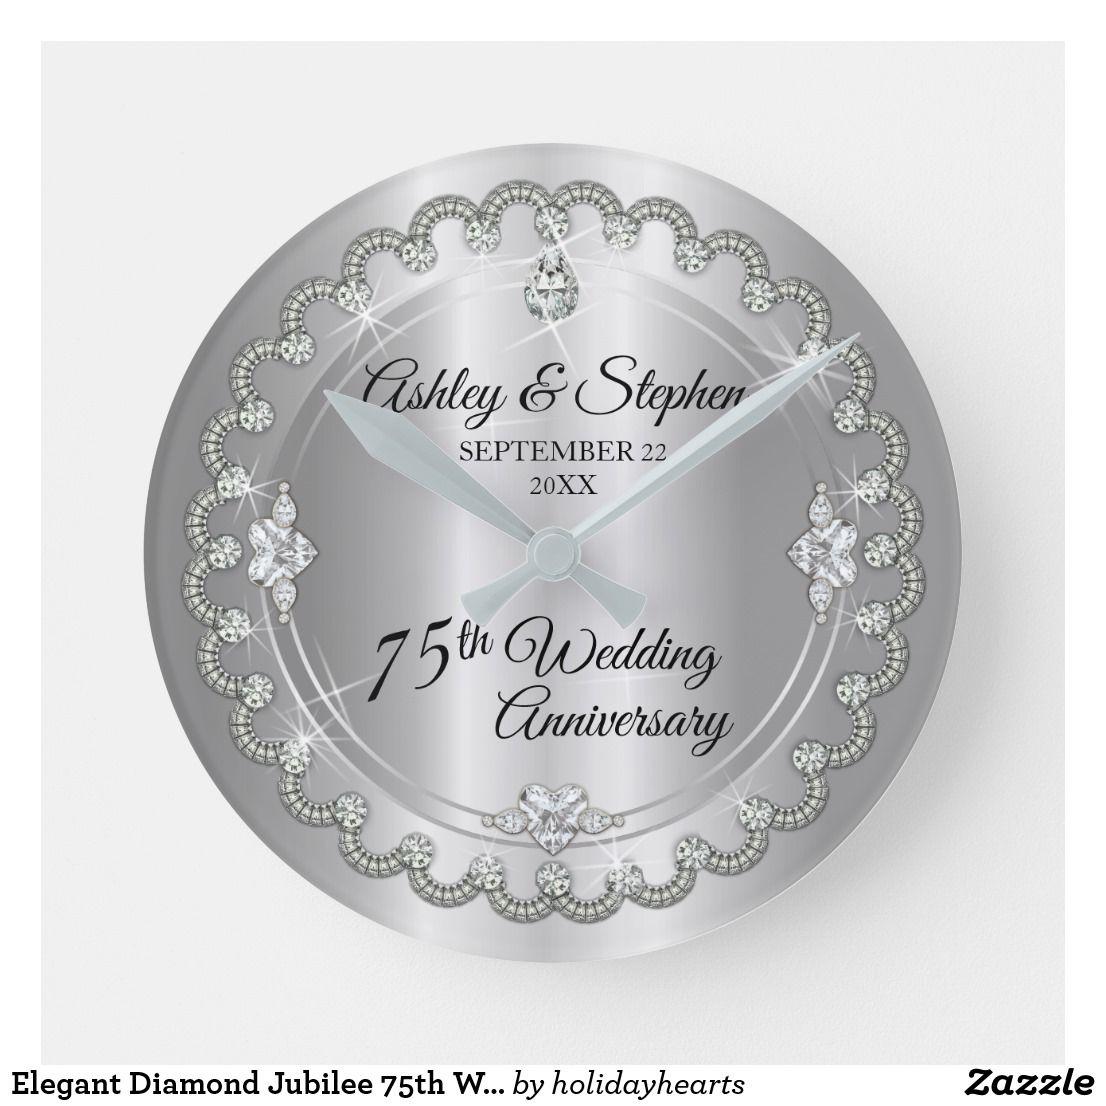 Elegant Diamond Jubilee 75th Wedding Anniversary Round Clock Zazzle Com Au 45th Wedding Anniversary Gifts 40th Wedding Anniversary 2nd Wedding Anniversary